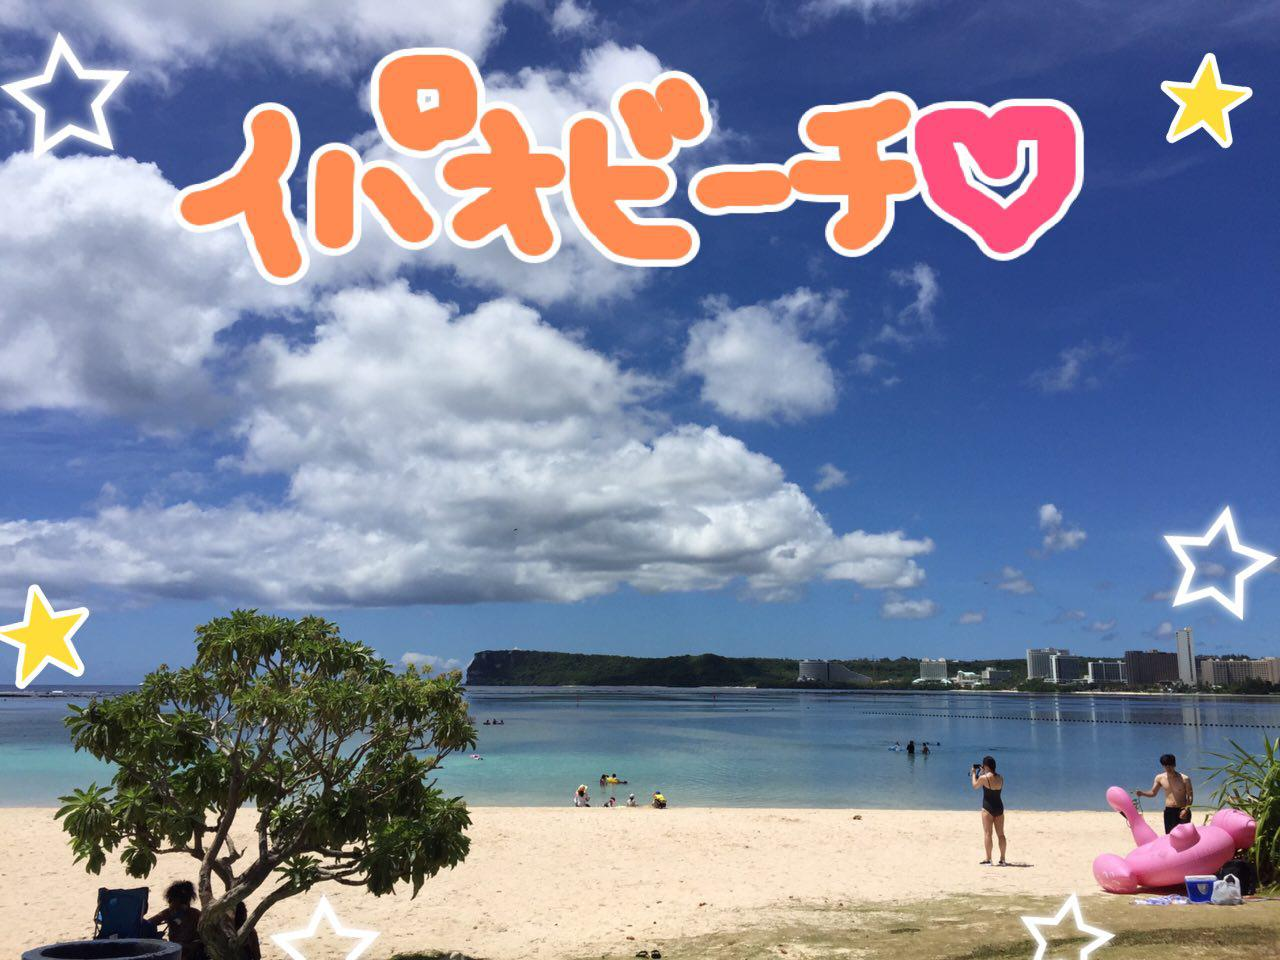 photo_2017-06-08_20-12-51.jpg